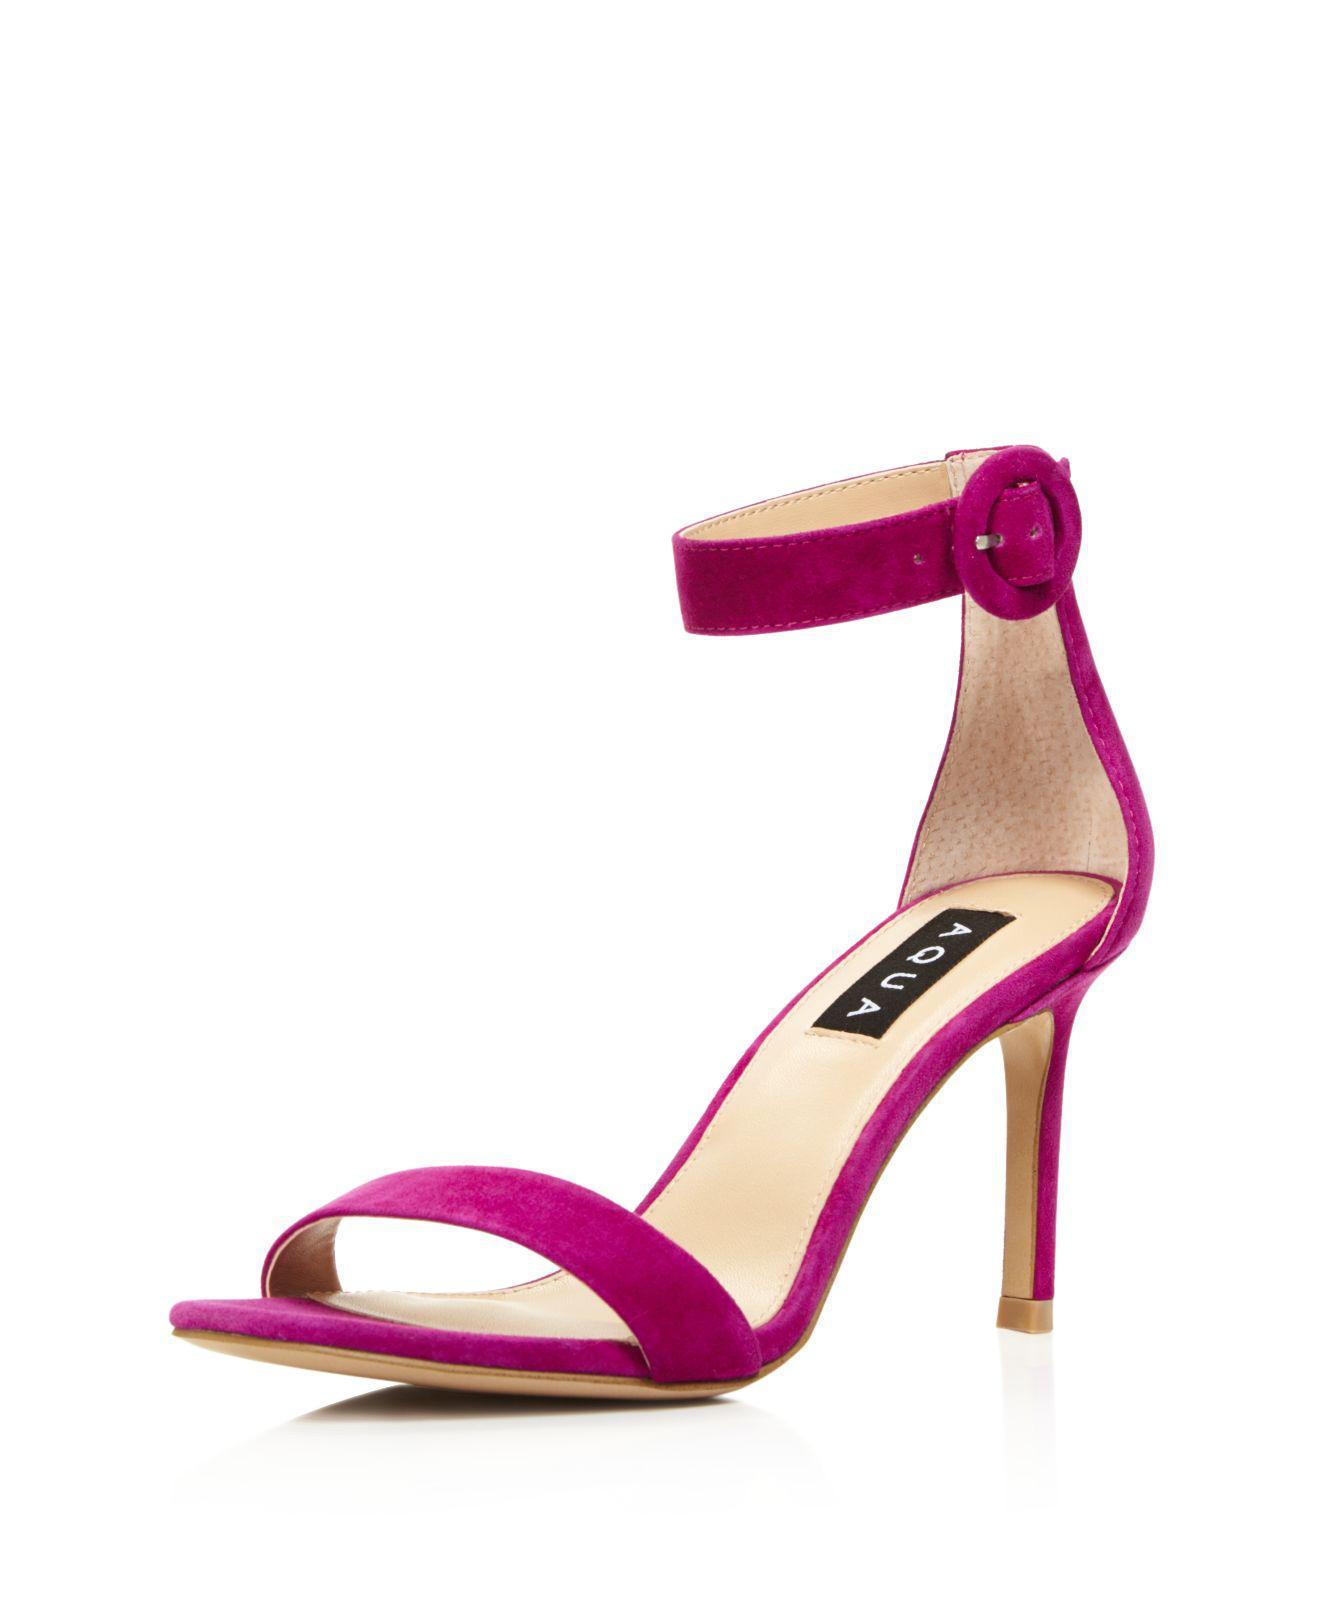 Aqua Women's Seven Suede High-Heel Ankle Strap Sandals - 100% Exclusive QmTq9d7K